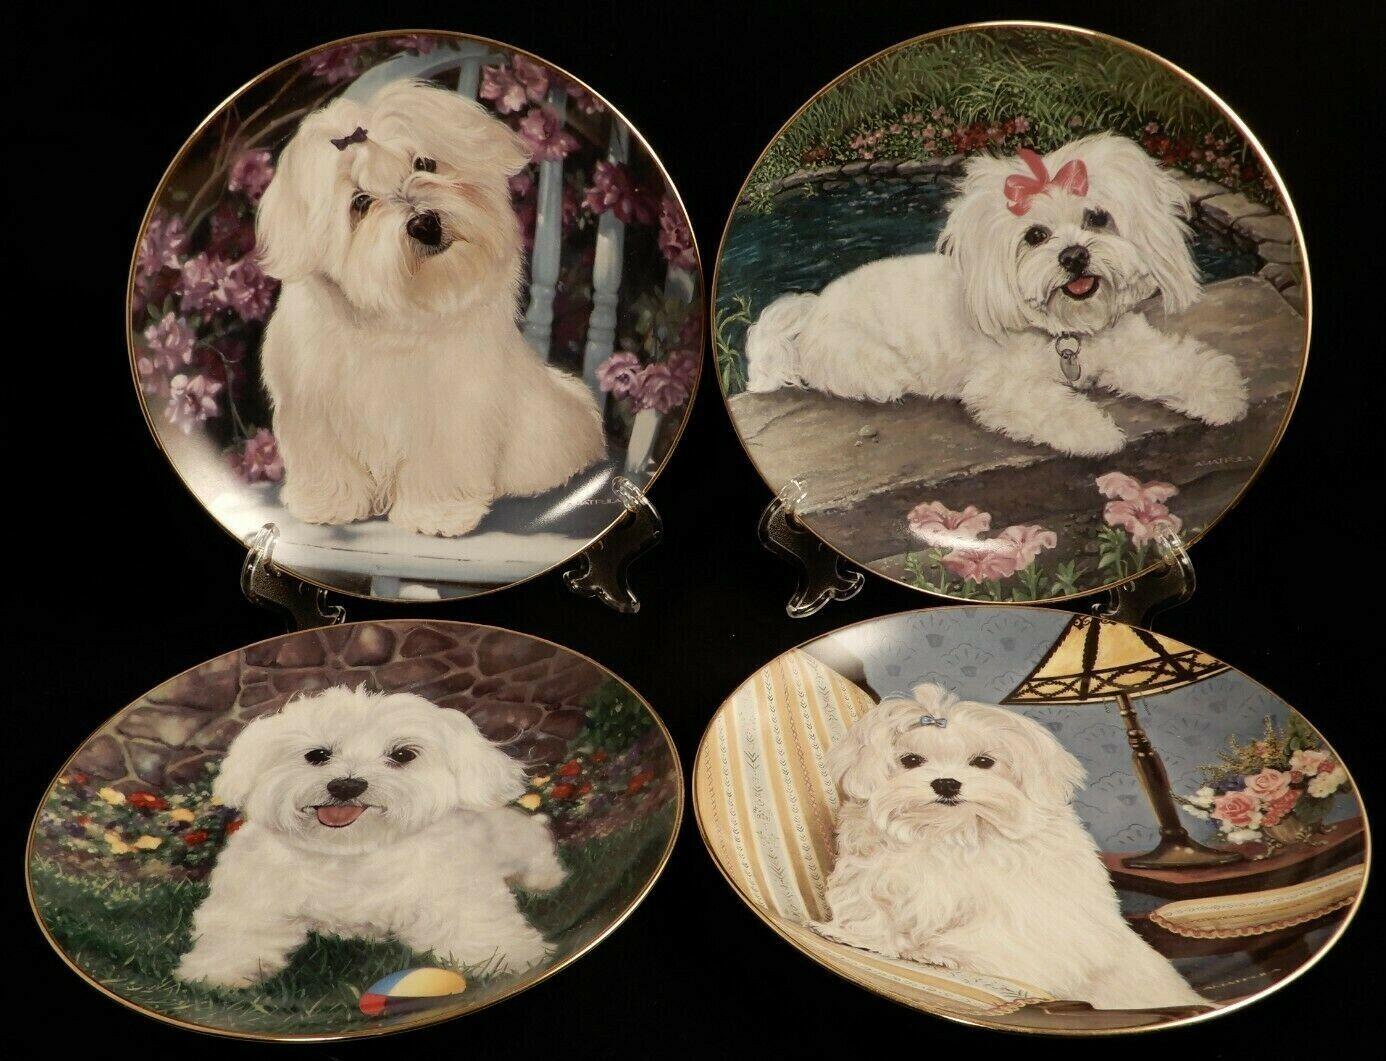 Danbury Mint Maltese Dog Collector Plates by Michele Amatrula Original Packaging